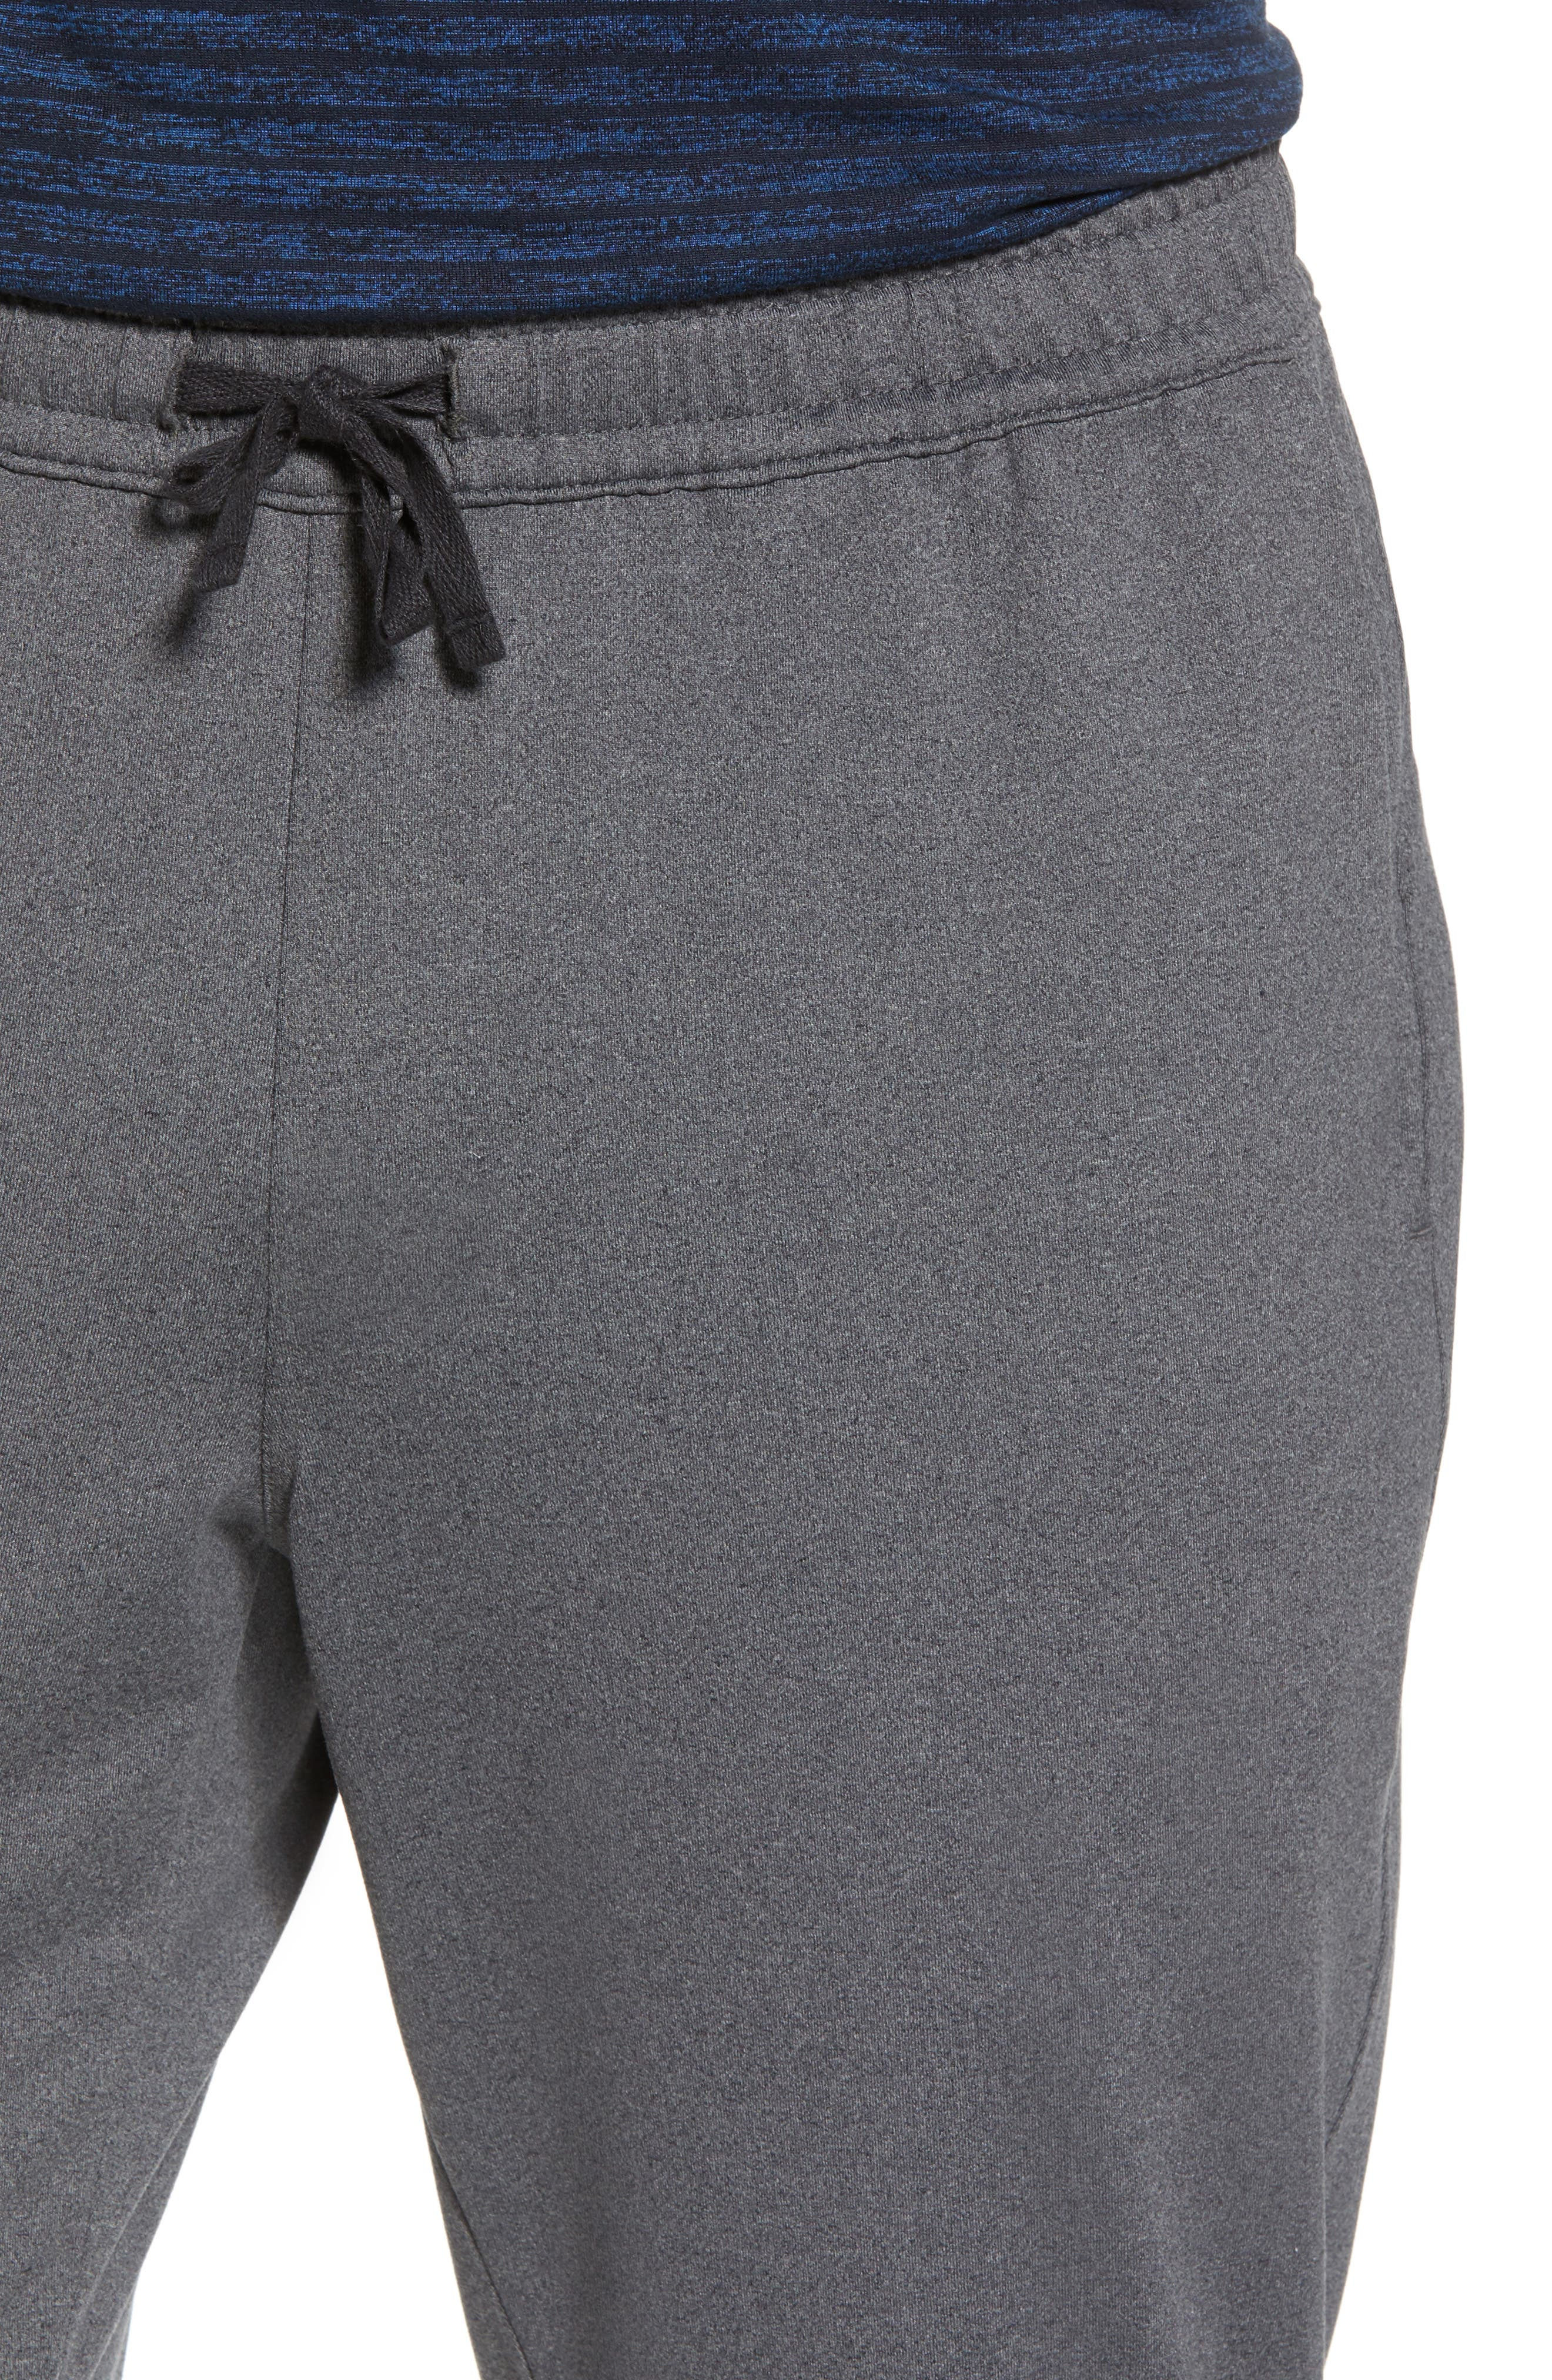 ZELLA,                             Active Crop Jogger Pants,                             Alternate thumbnail 4, color,                             021